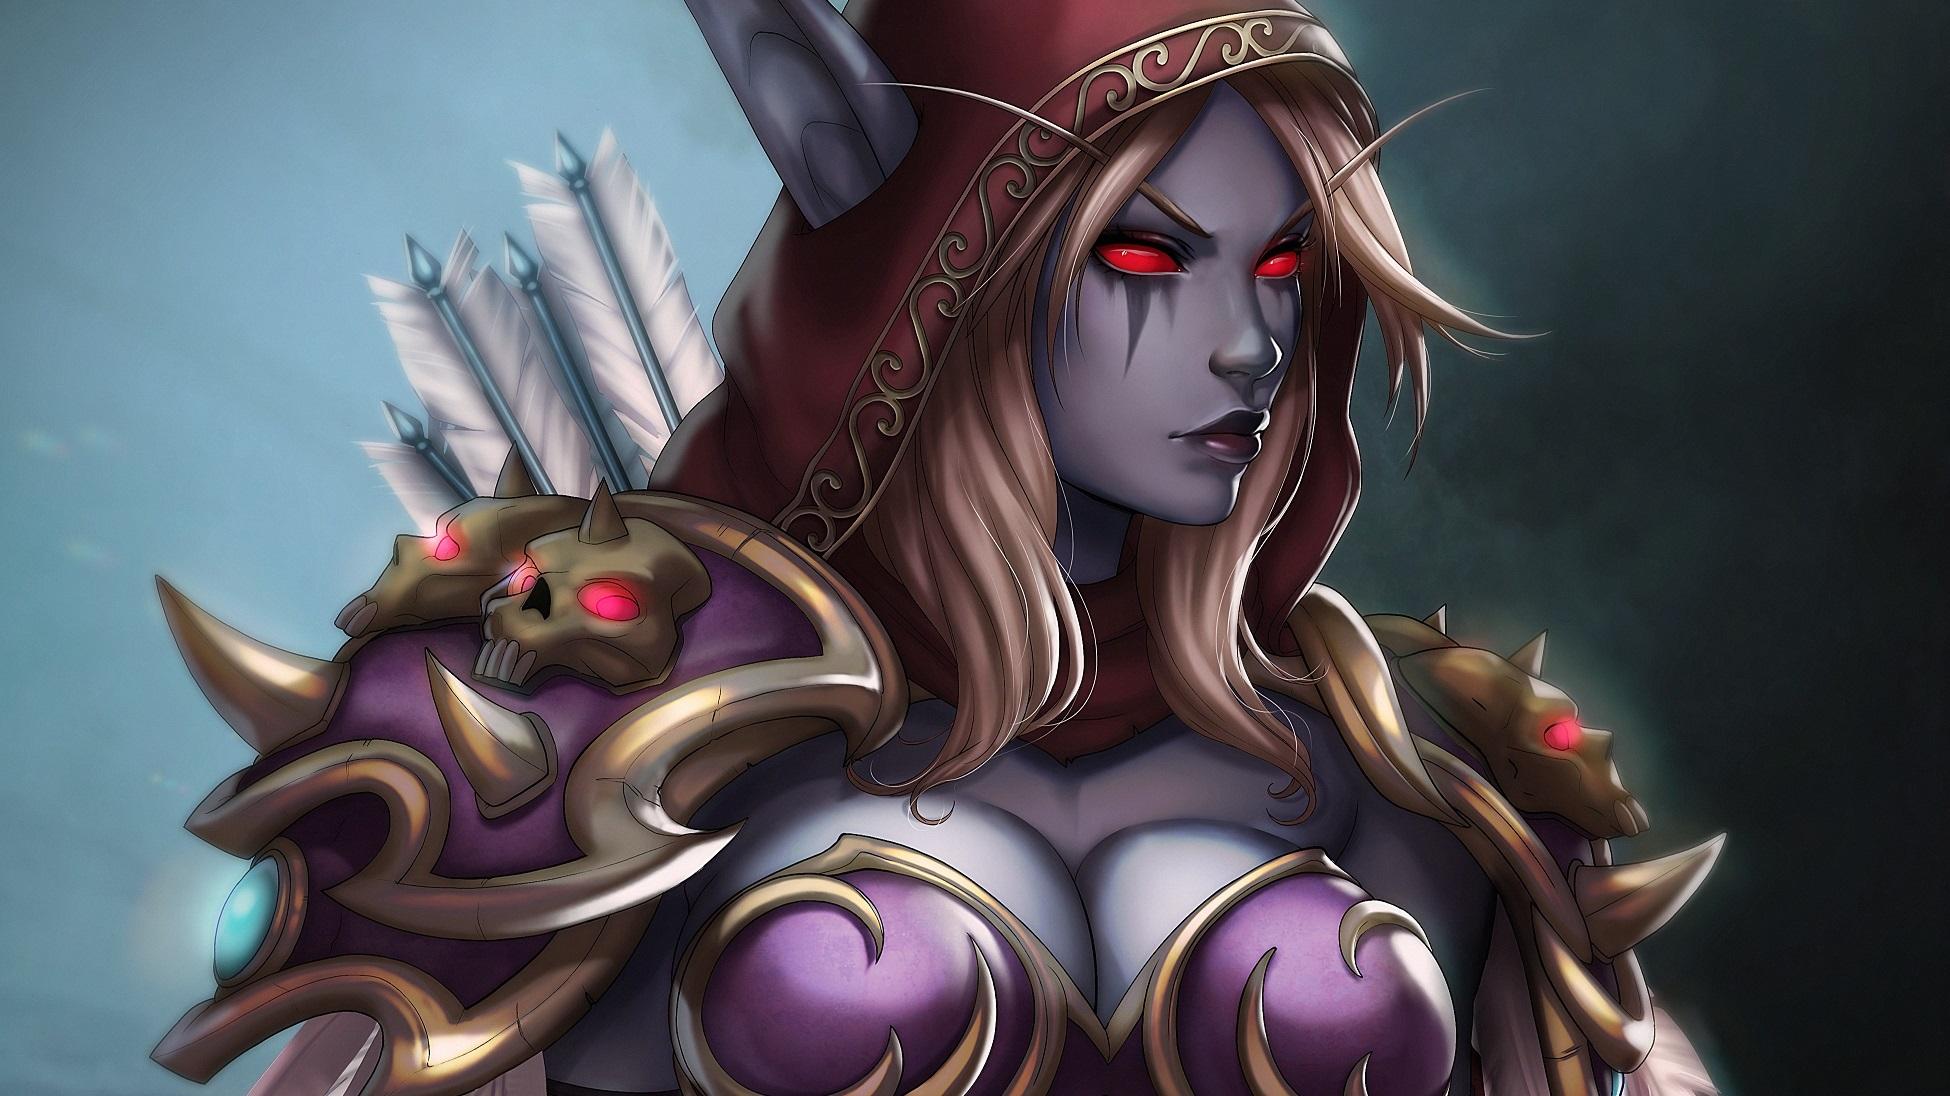 Dark Fantasy Big Tits Art